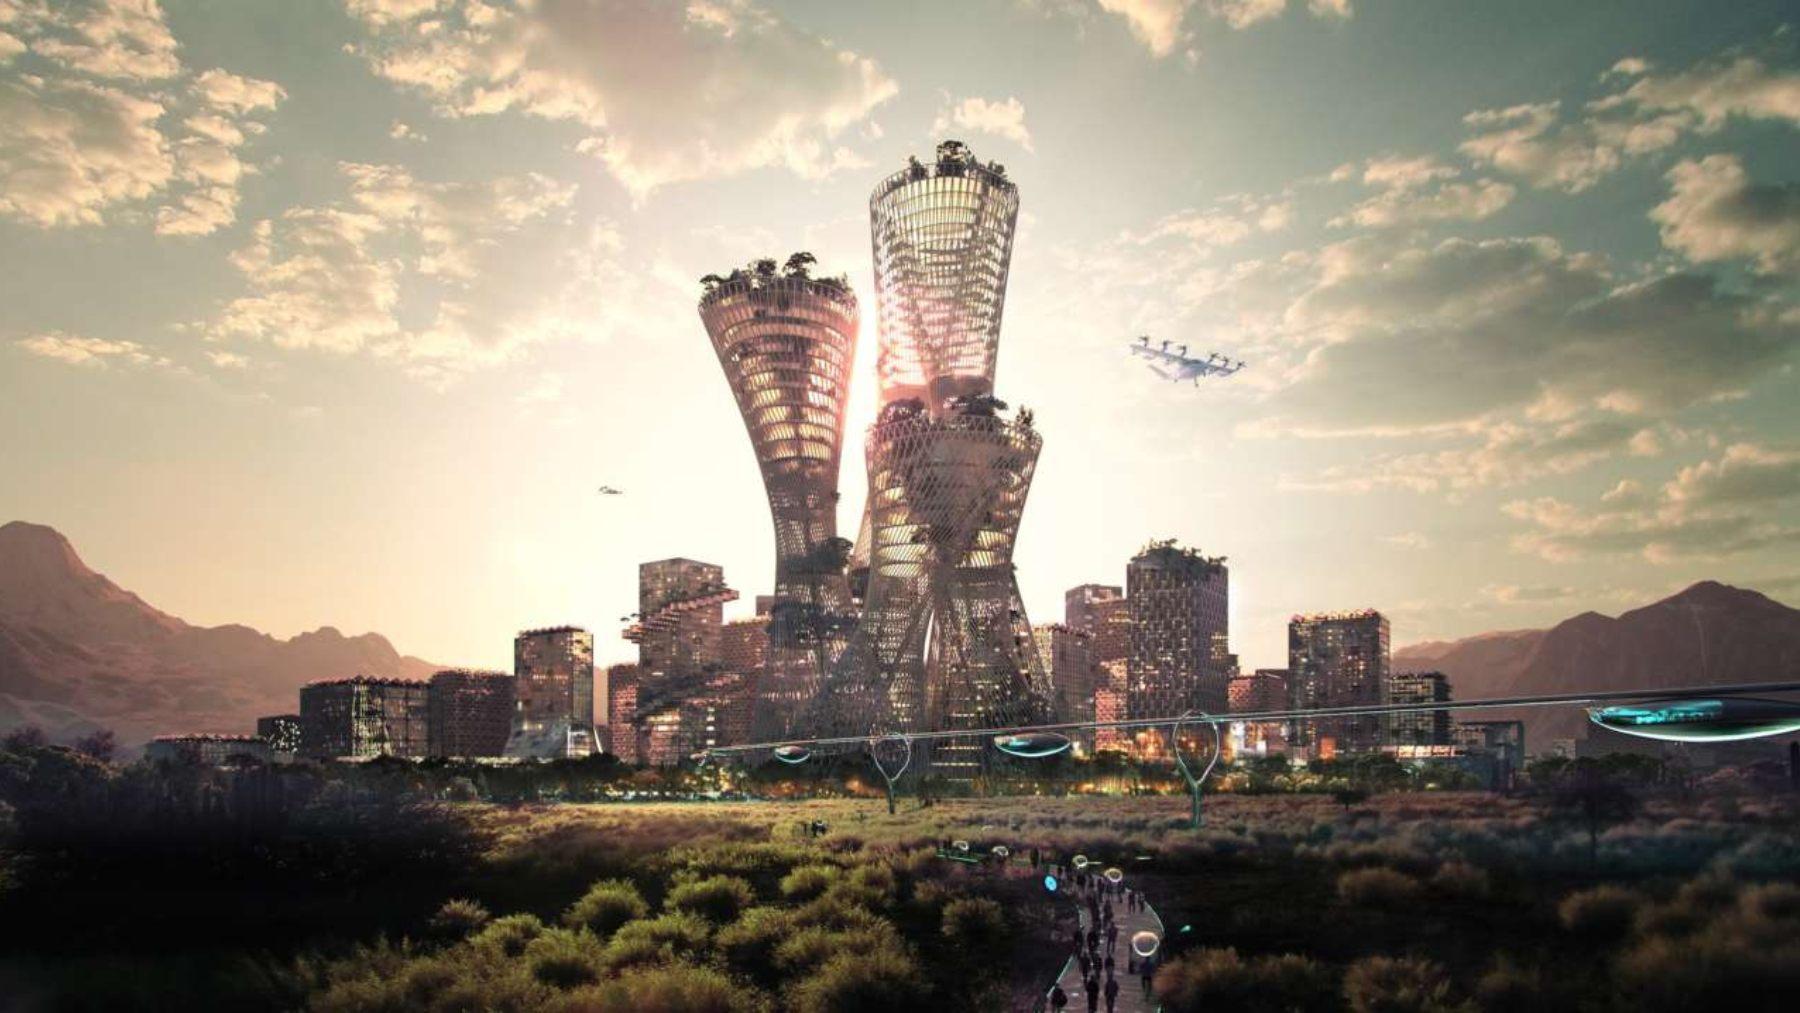 Telosa, la ciudad vanguardista del futuro